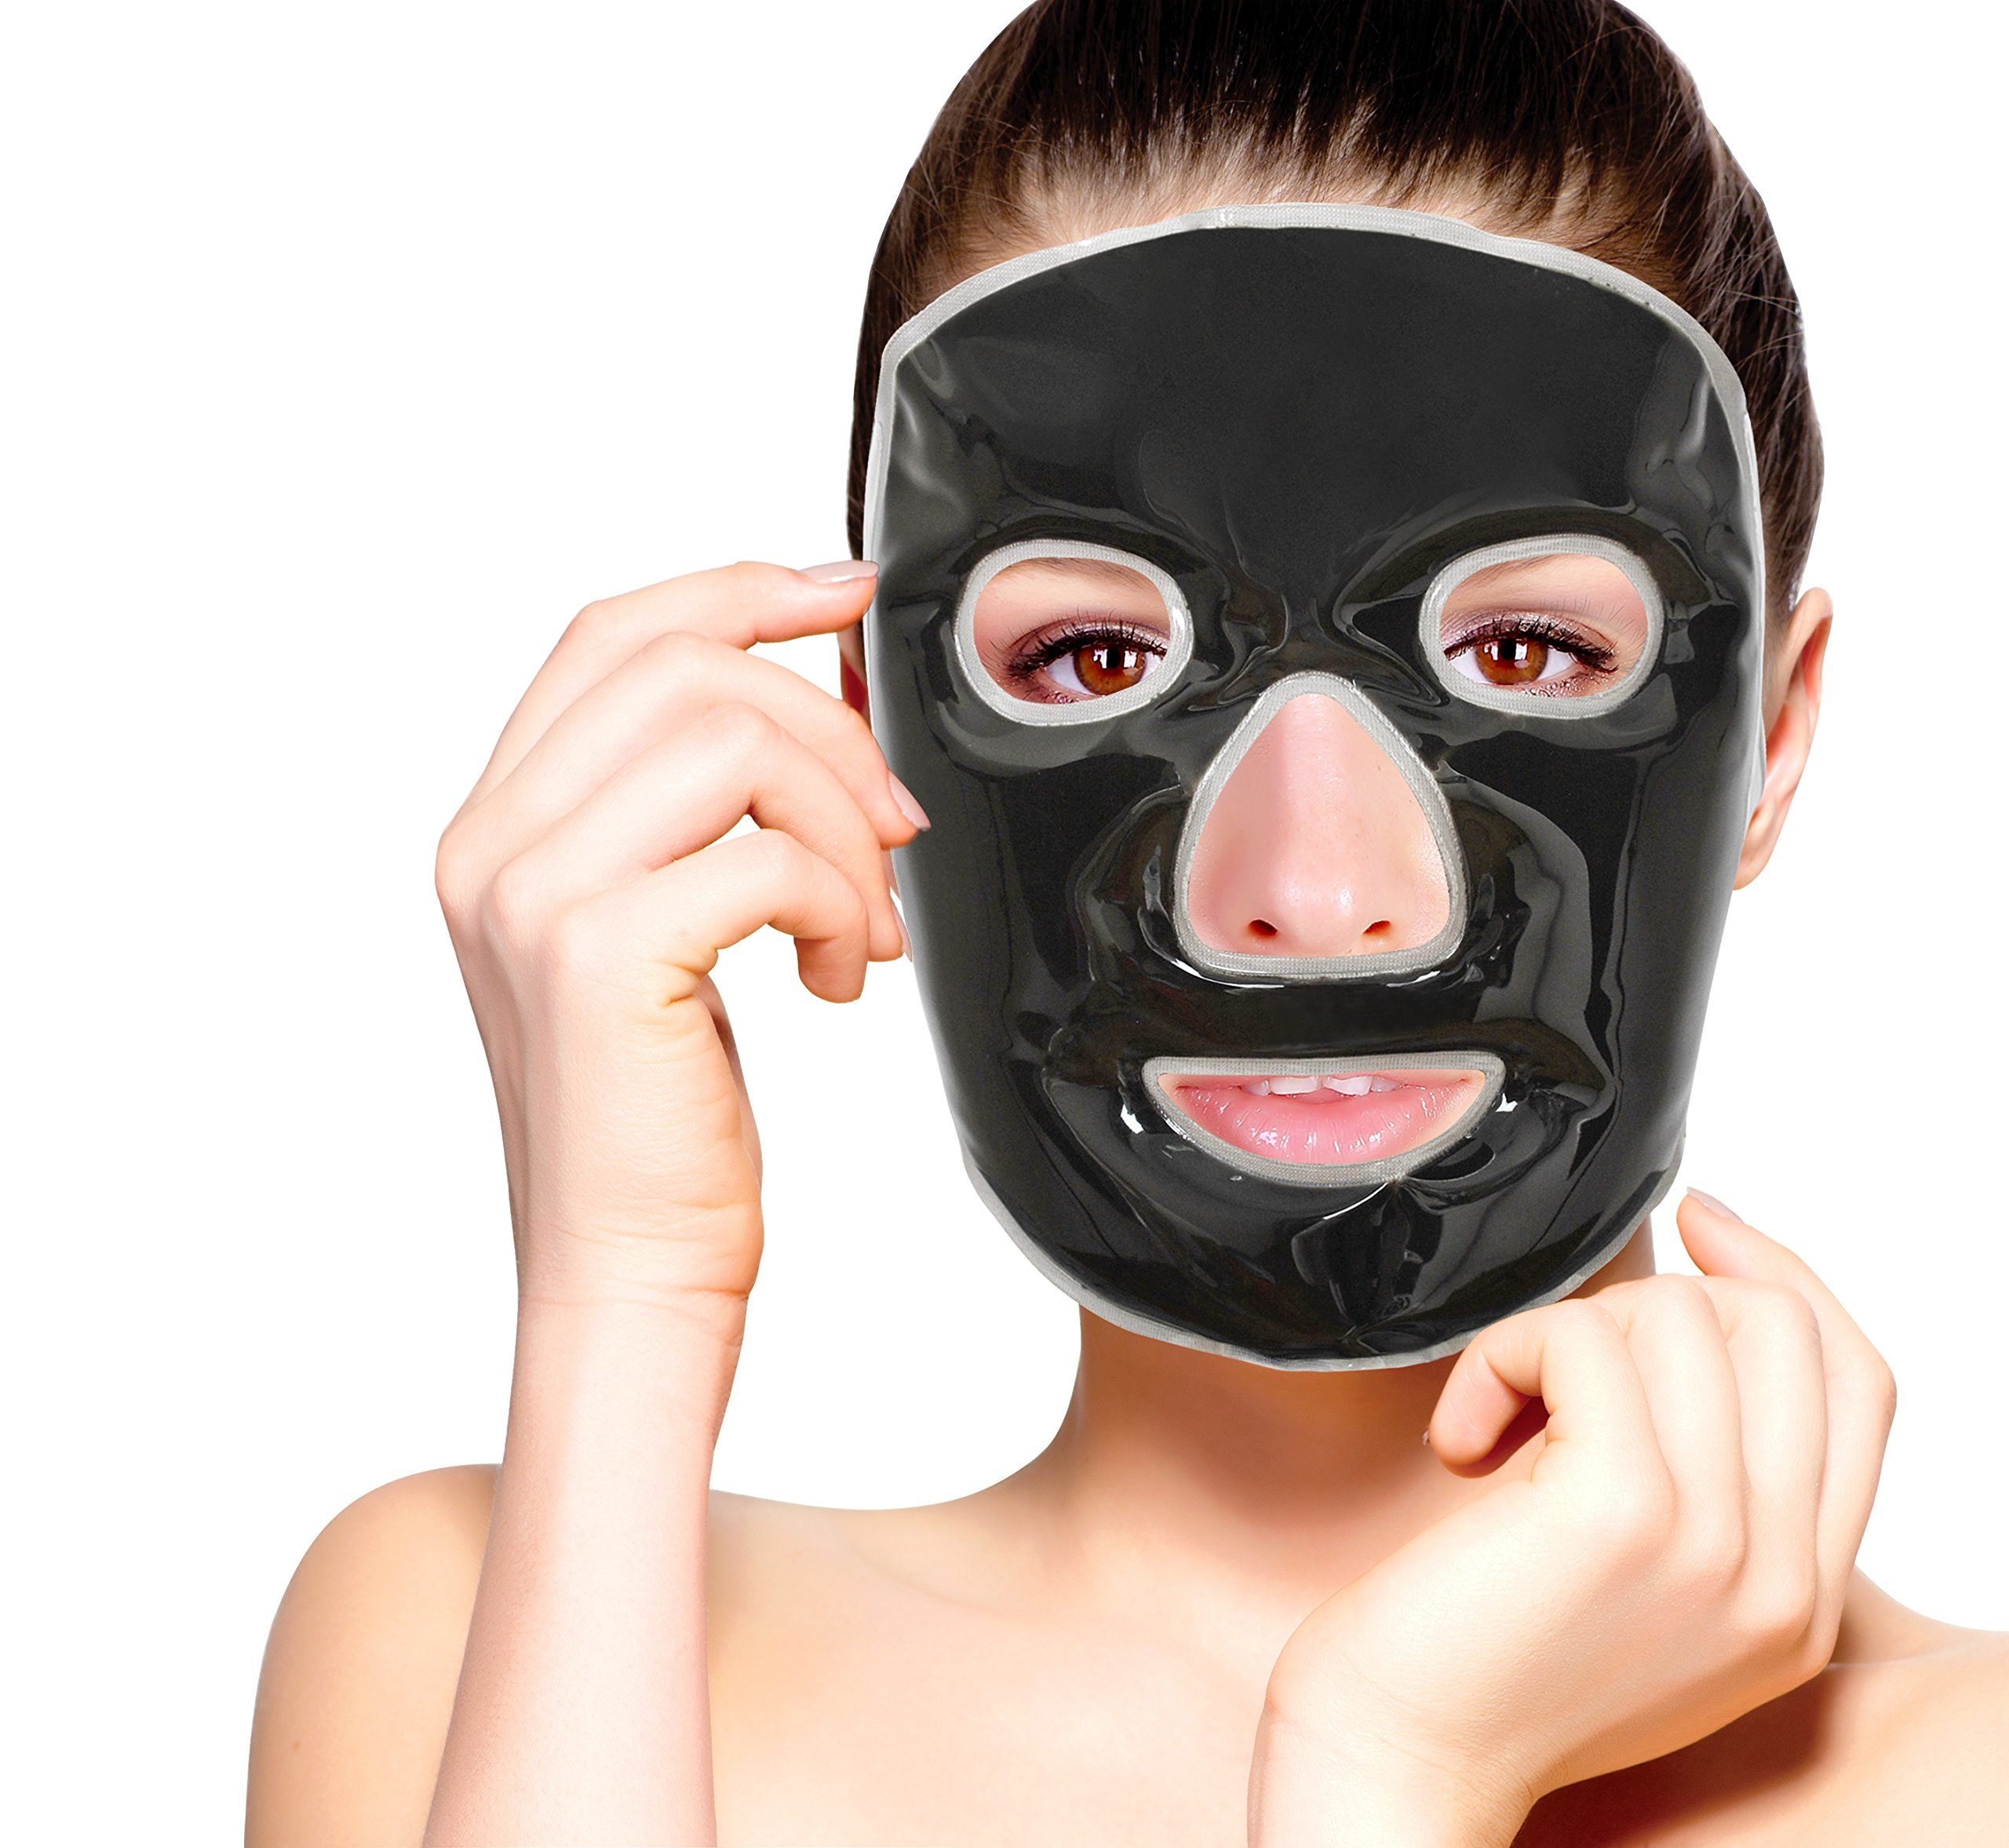 Facial heating pad